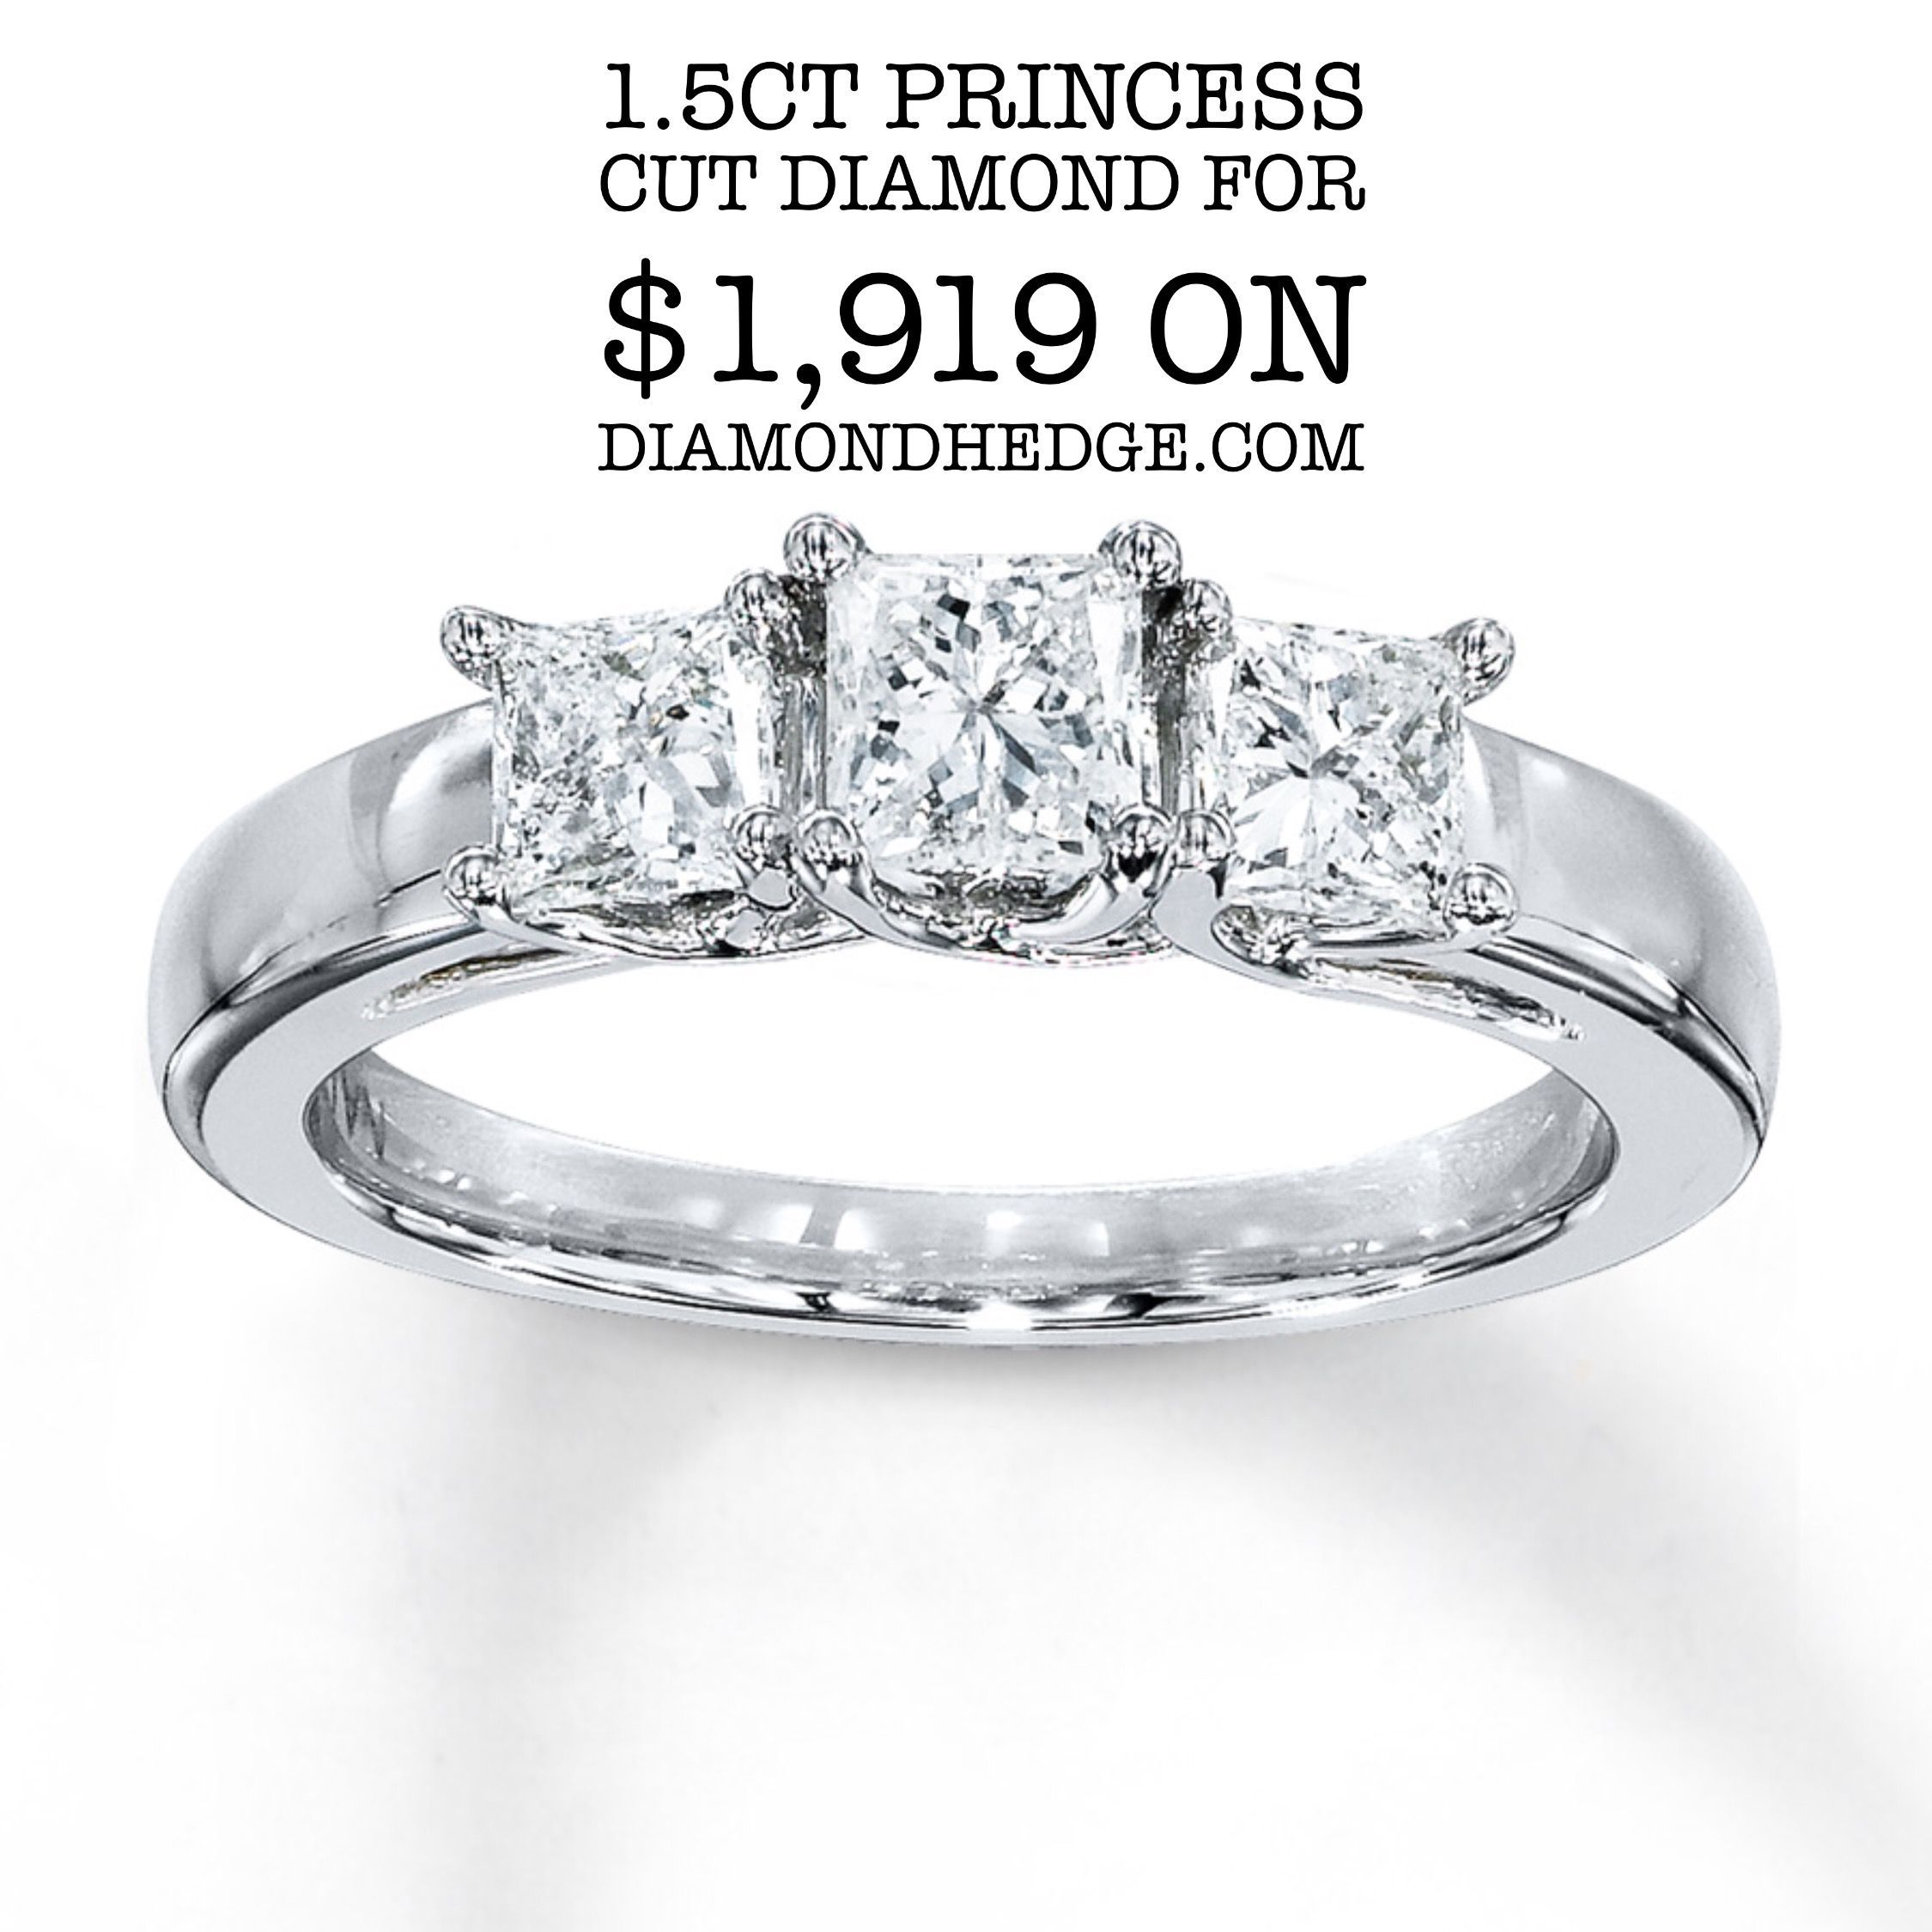 f8367b9f51a05 1.5ct Princess cut diamond for $1,919 on DiamondHedge.com for a ...